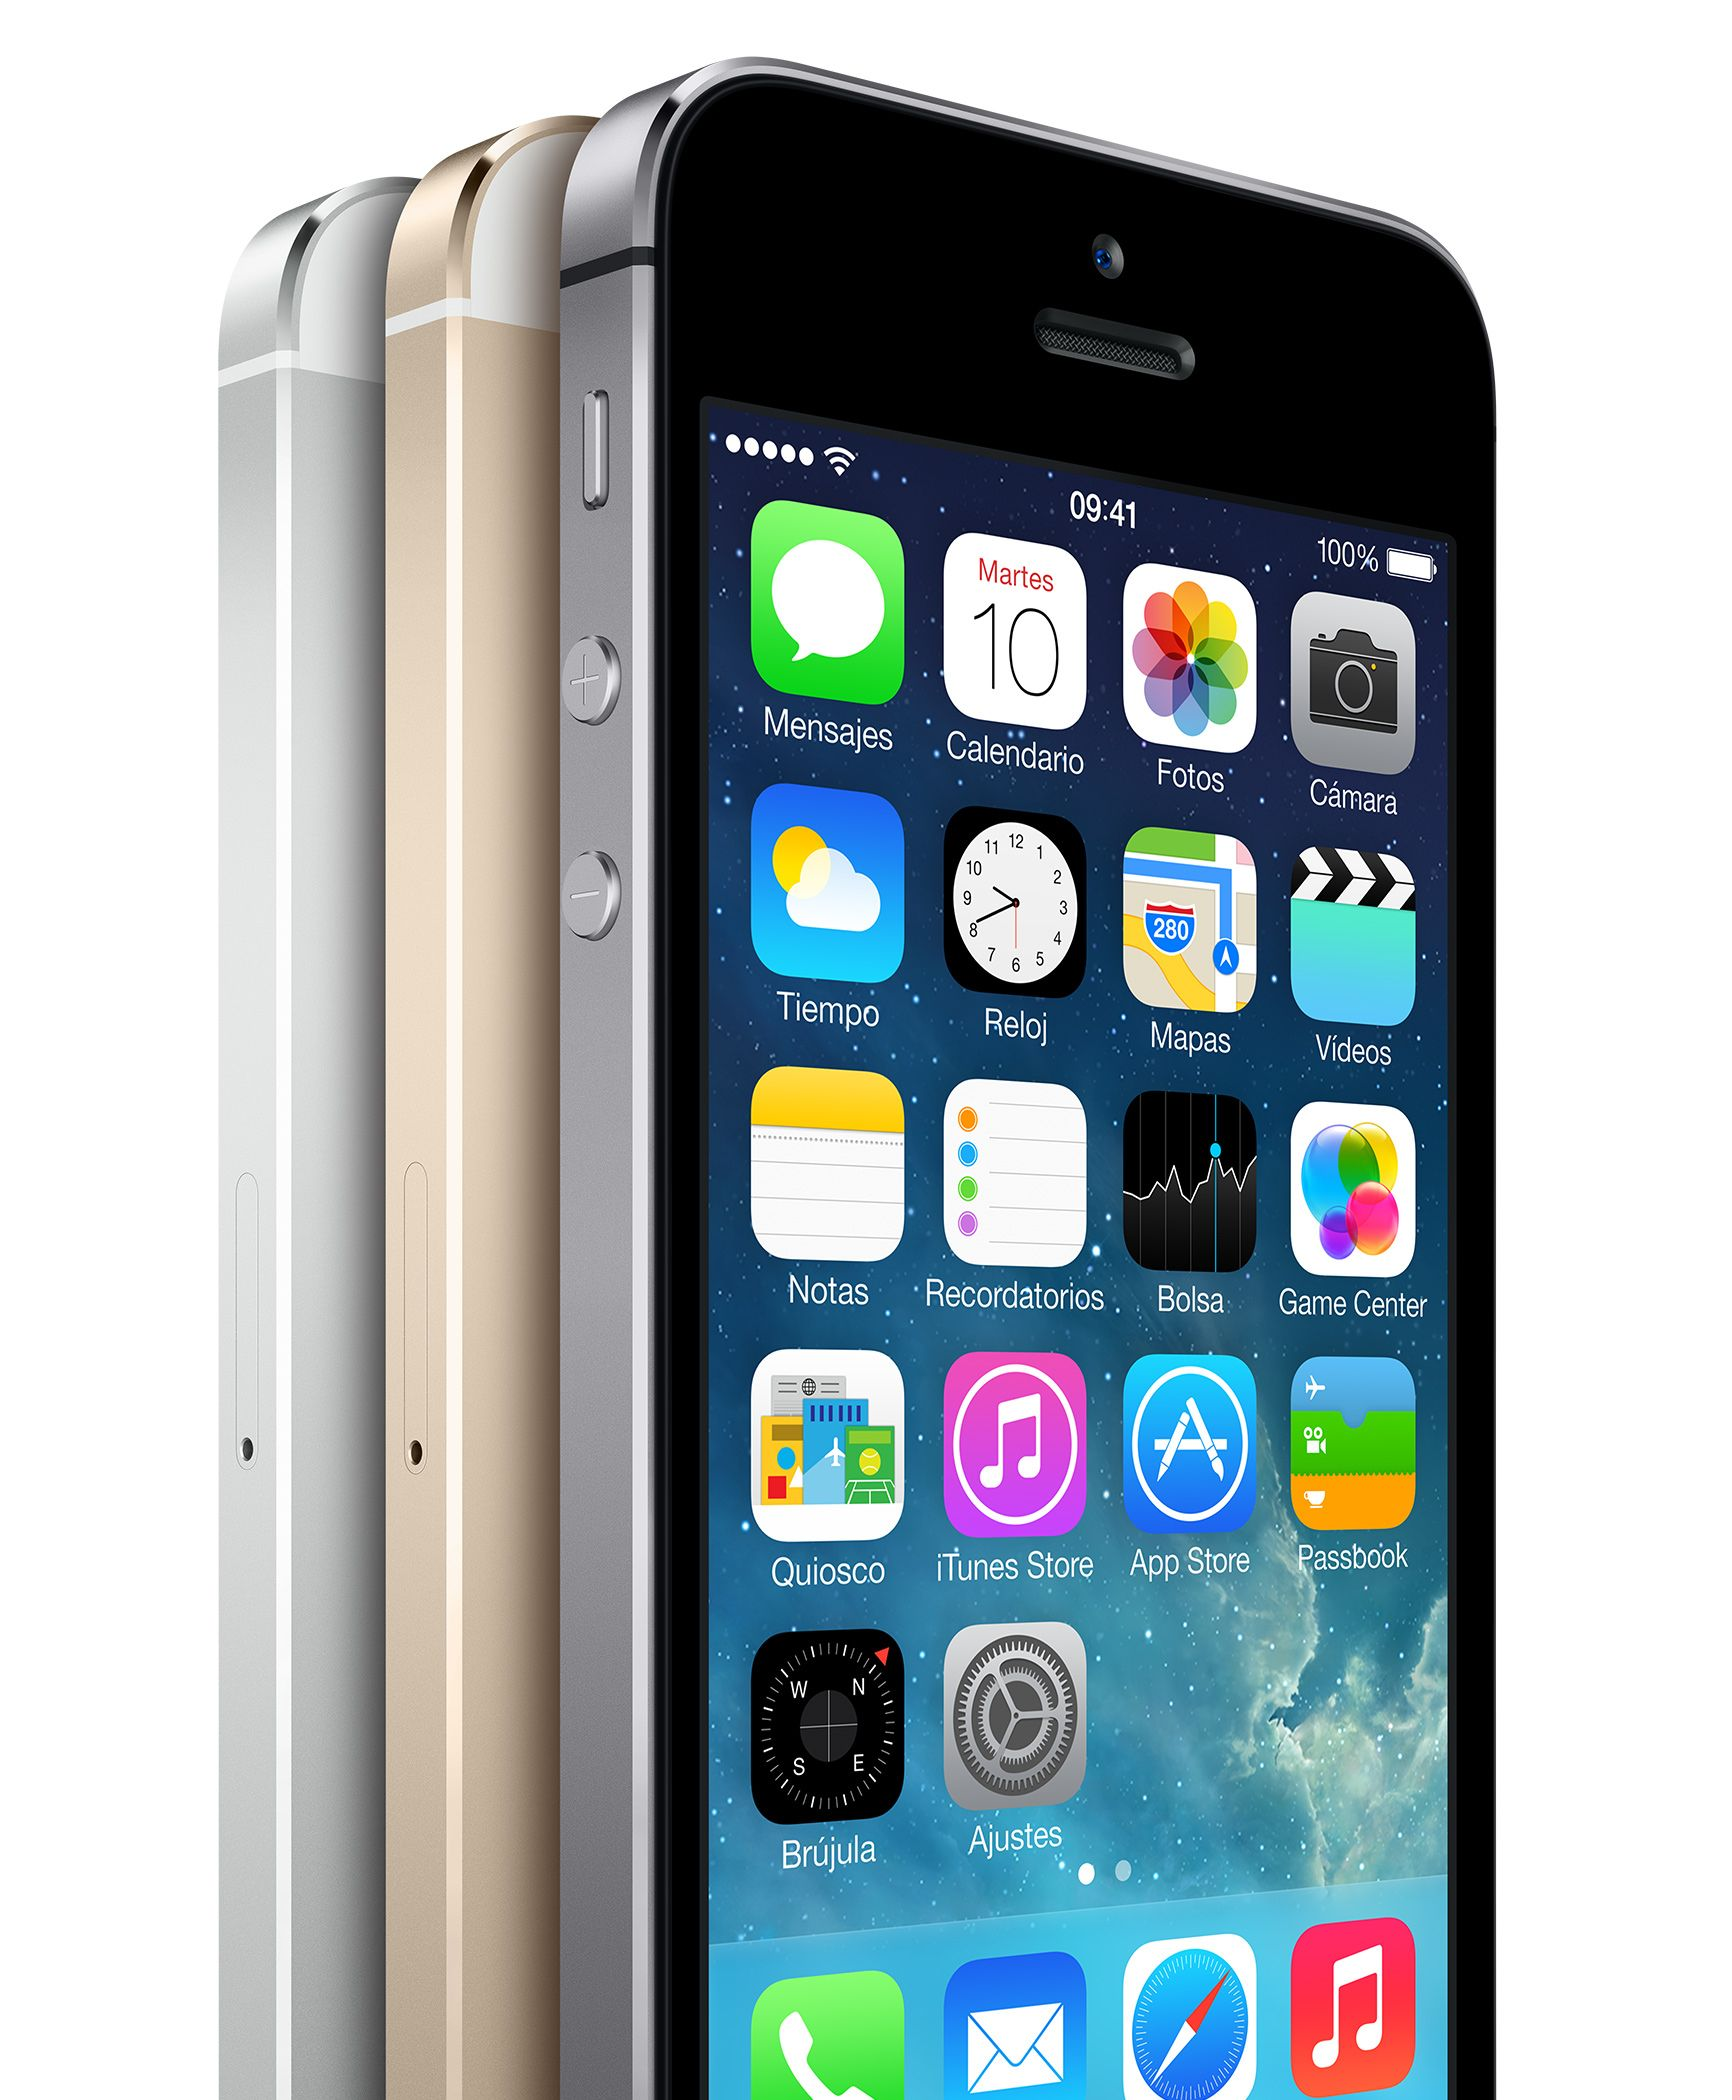 Www etradesupply com media uploaded iphone 5c vs iphone 5 screen jpg - Iphone 5s Http Www Etradesupply Com Accessories Accessories